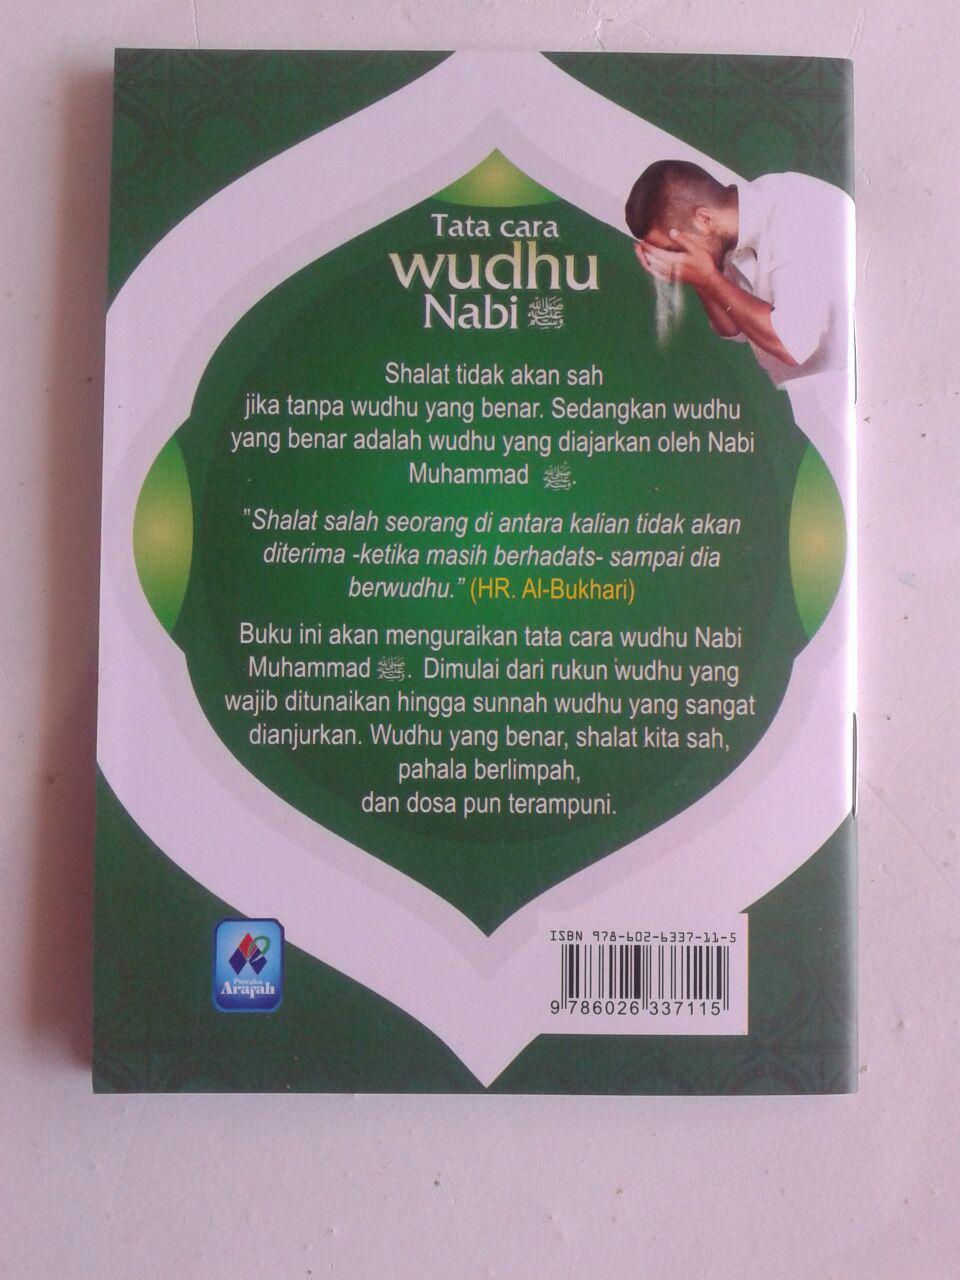 Buku Saku Tata Cara Wudhu Nabi Dilengkapi Mandi Janabah Tayamum cover